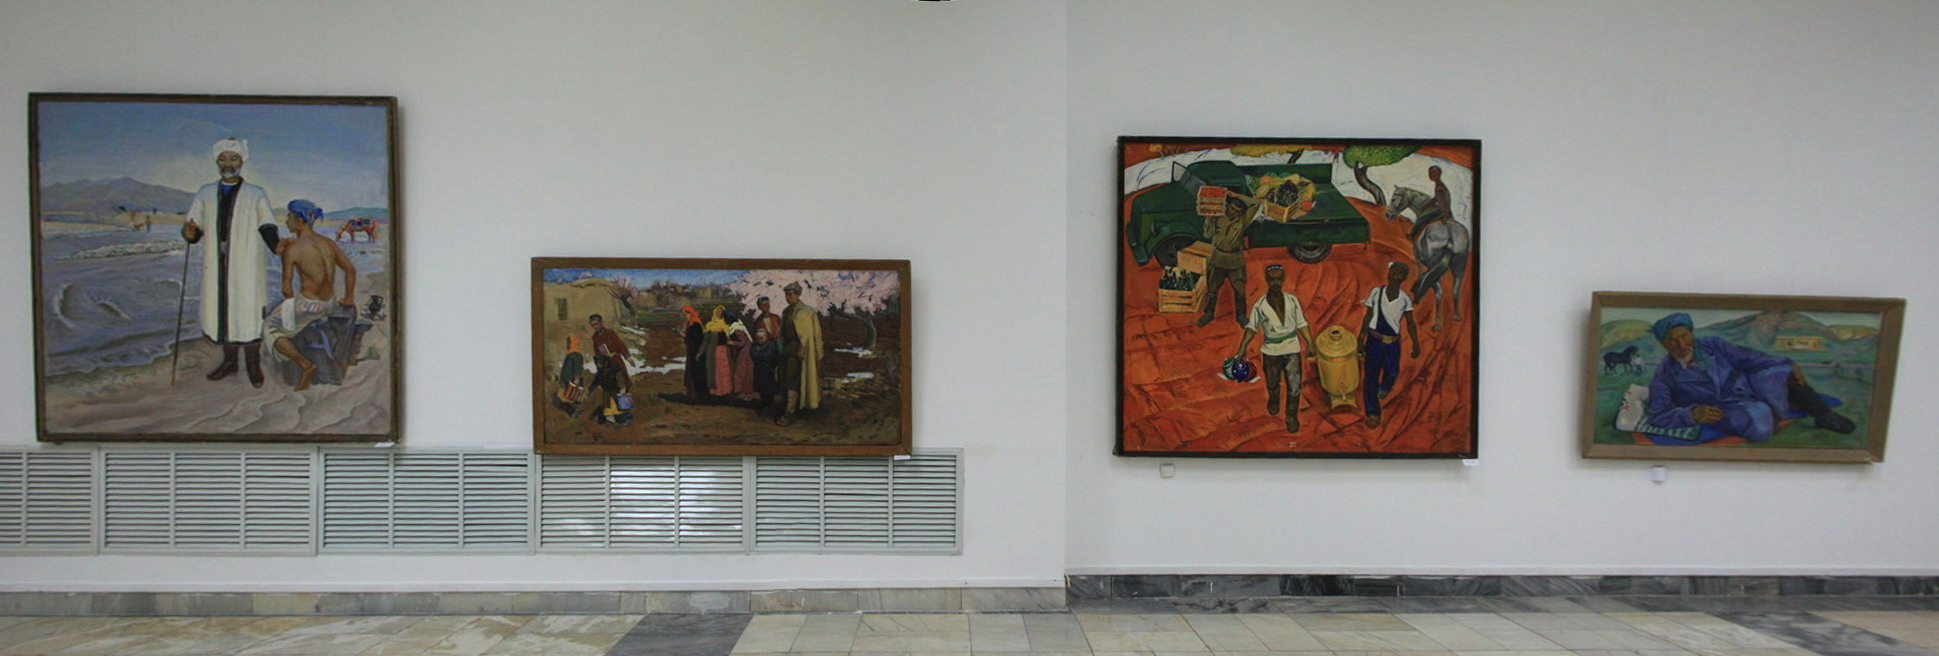 Бабаев Б. Экспозиция картин 2.